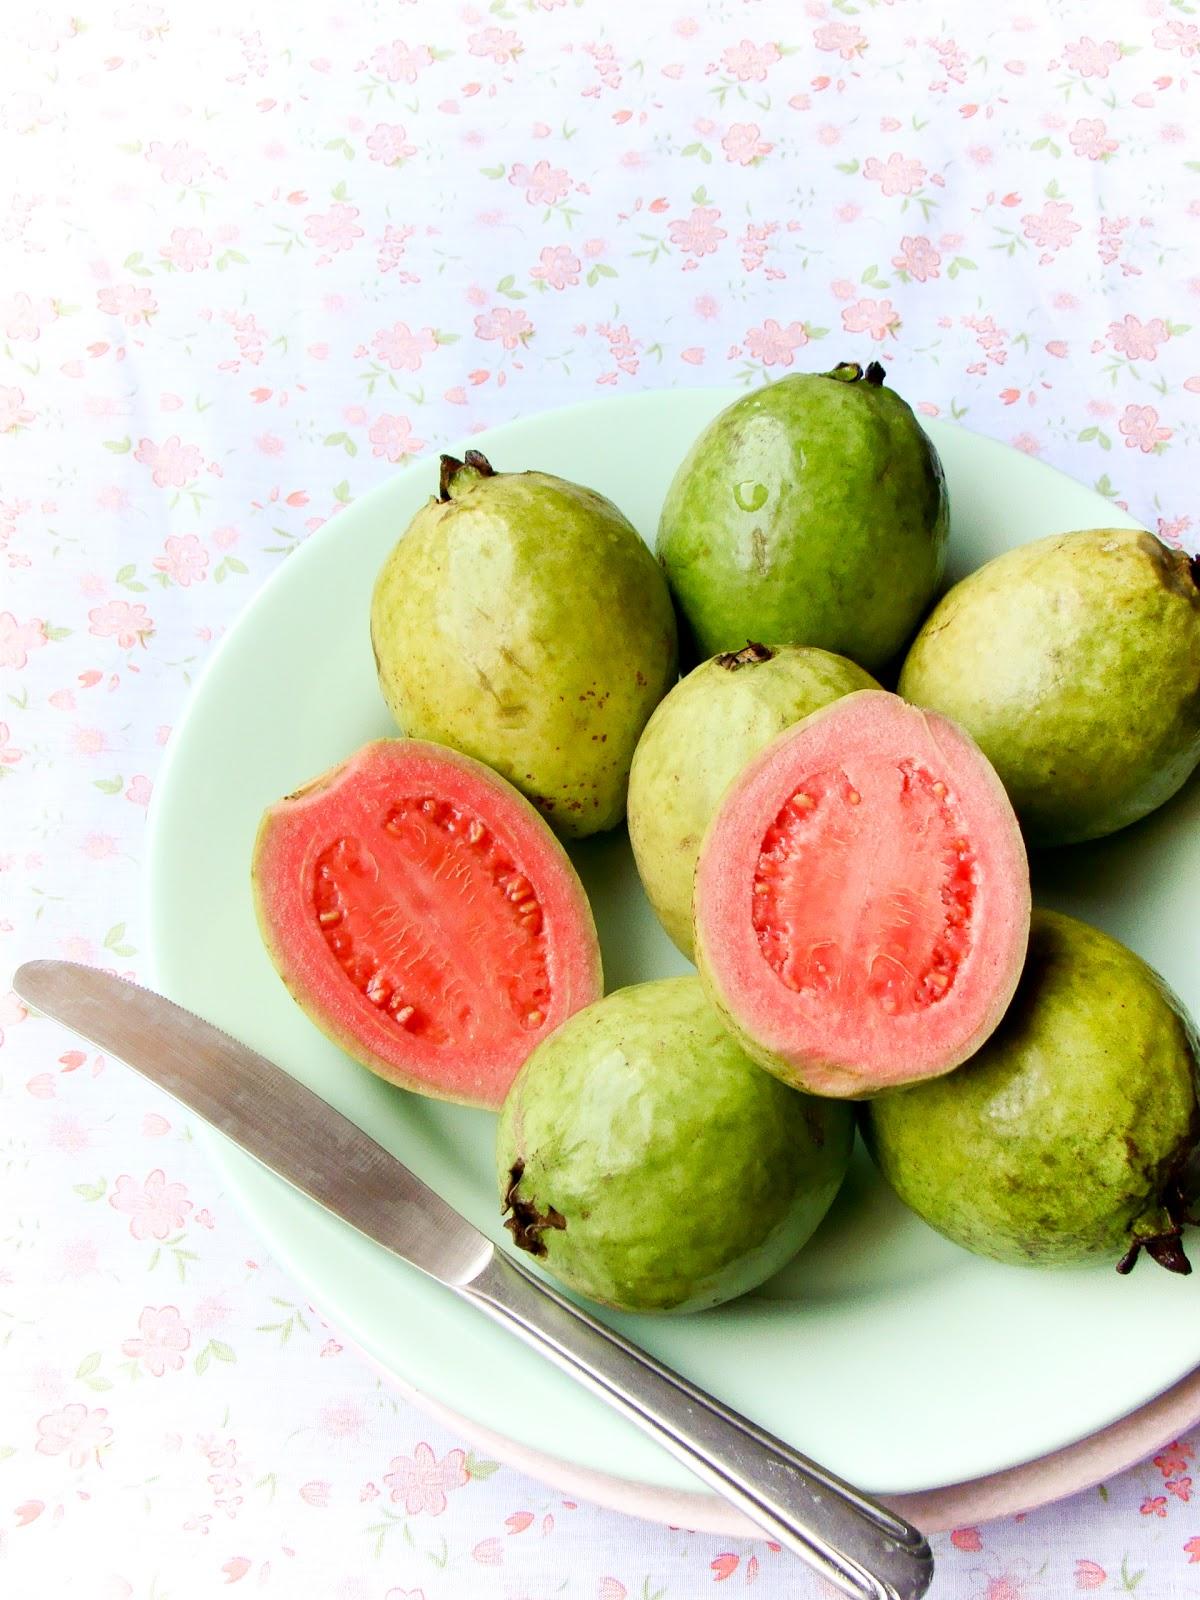 Lulu's Sweet Secrets: Guava Marmalade Cheesecake - Cheesecake de Goiabada